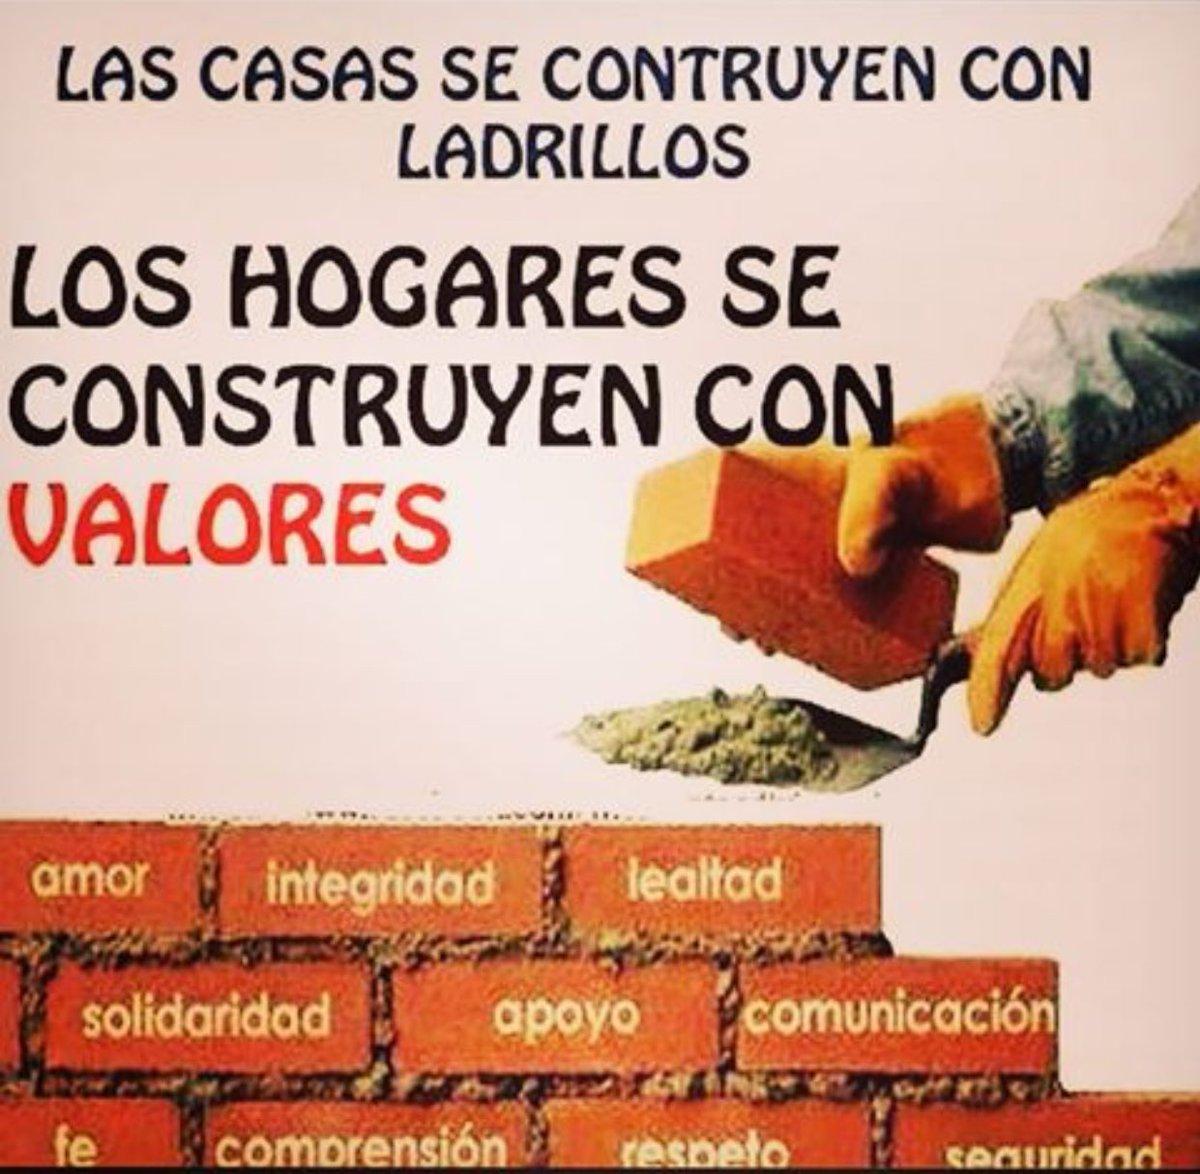 a6dd5ae37 Mary de Quevedo on Twitter: